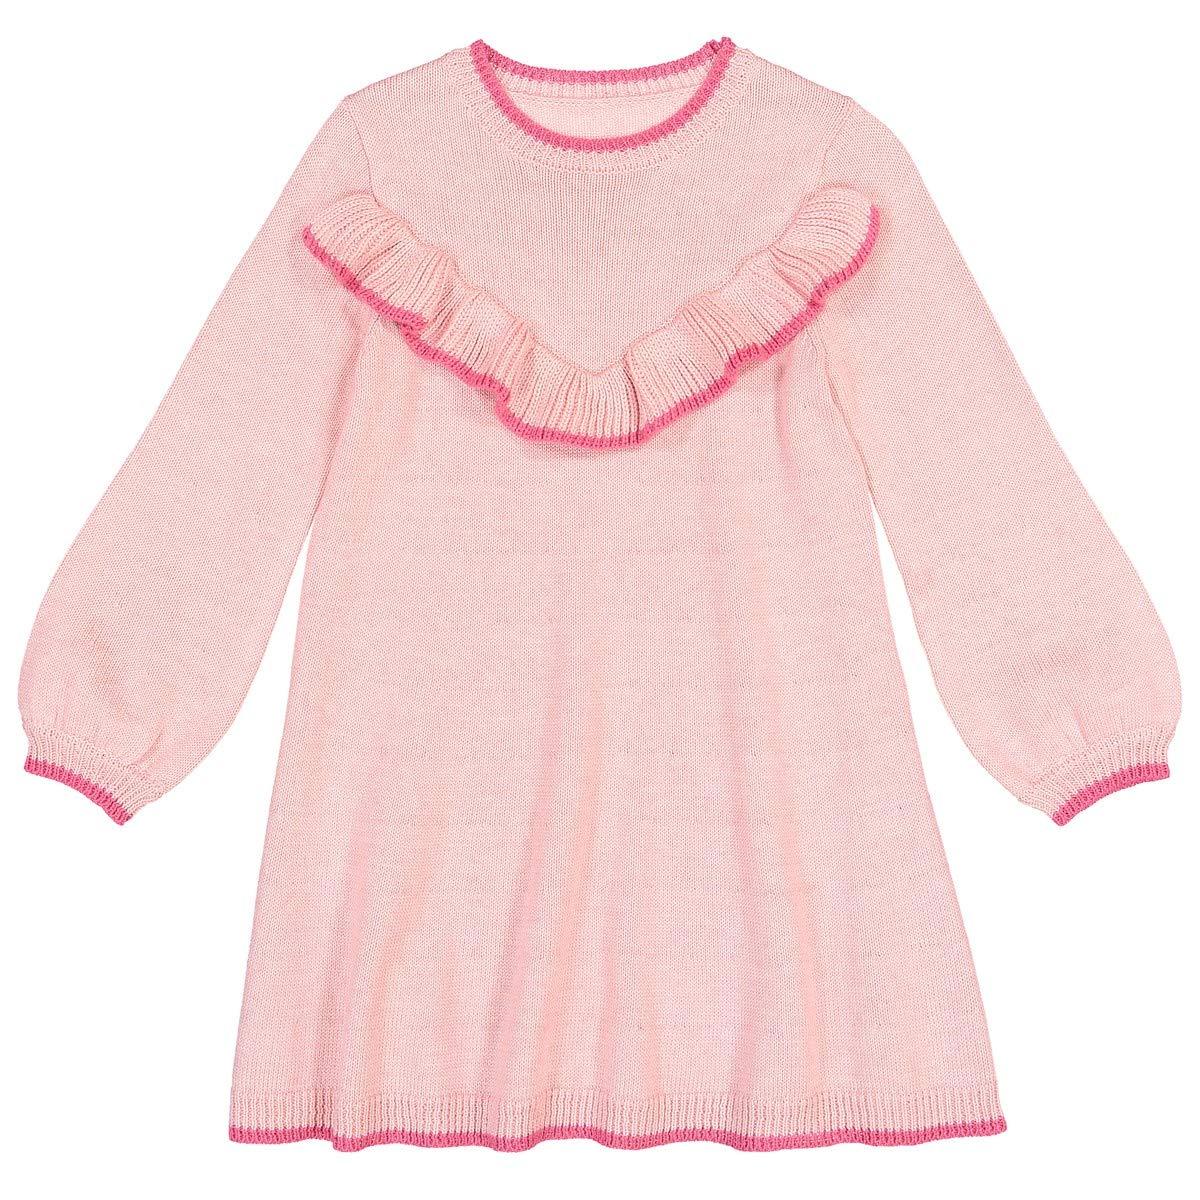 5fc7e9e92095 Amazon.com  La Redoute Collections Big Girls Ruffled Jumper Sweater Dress